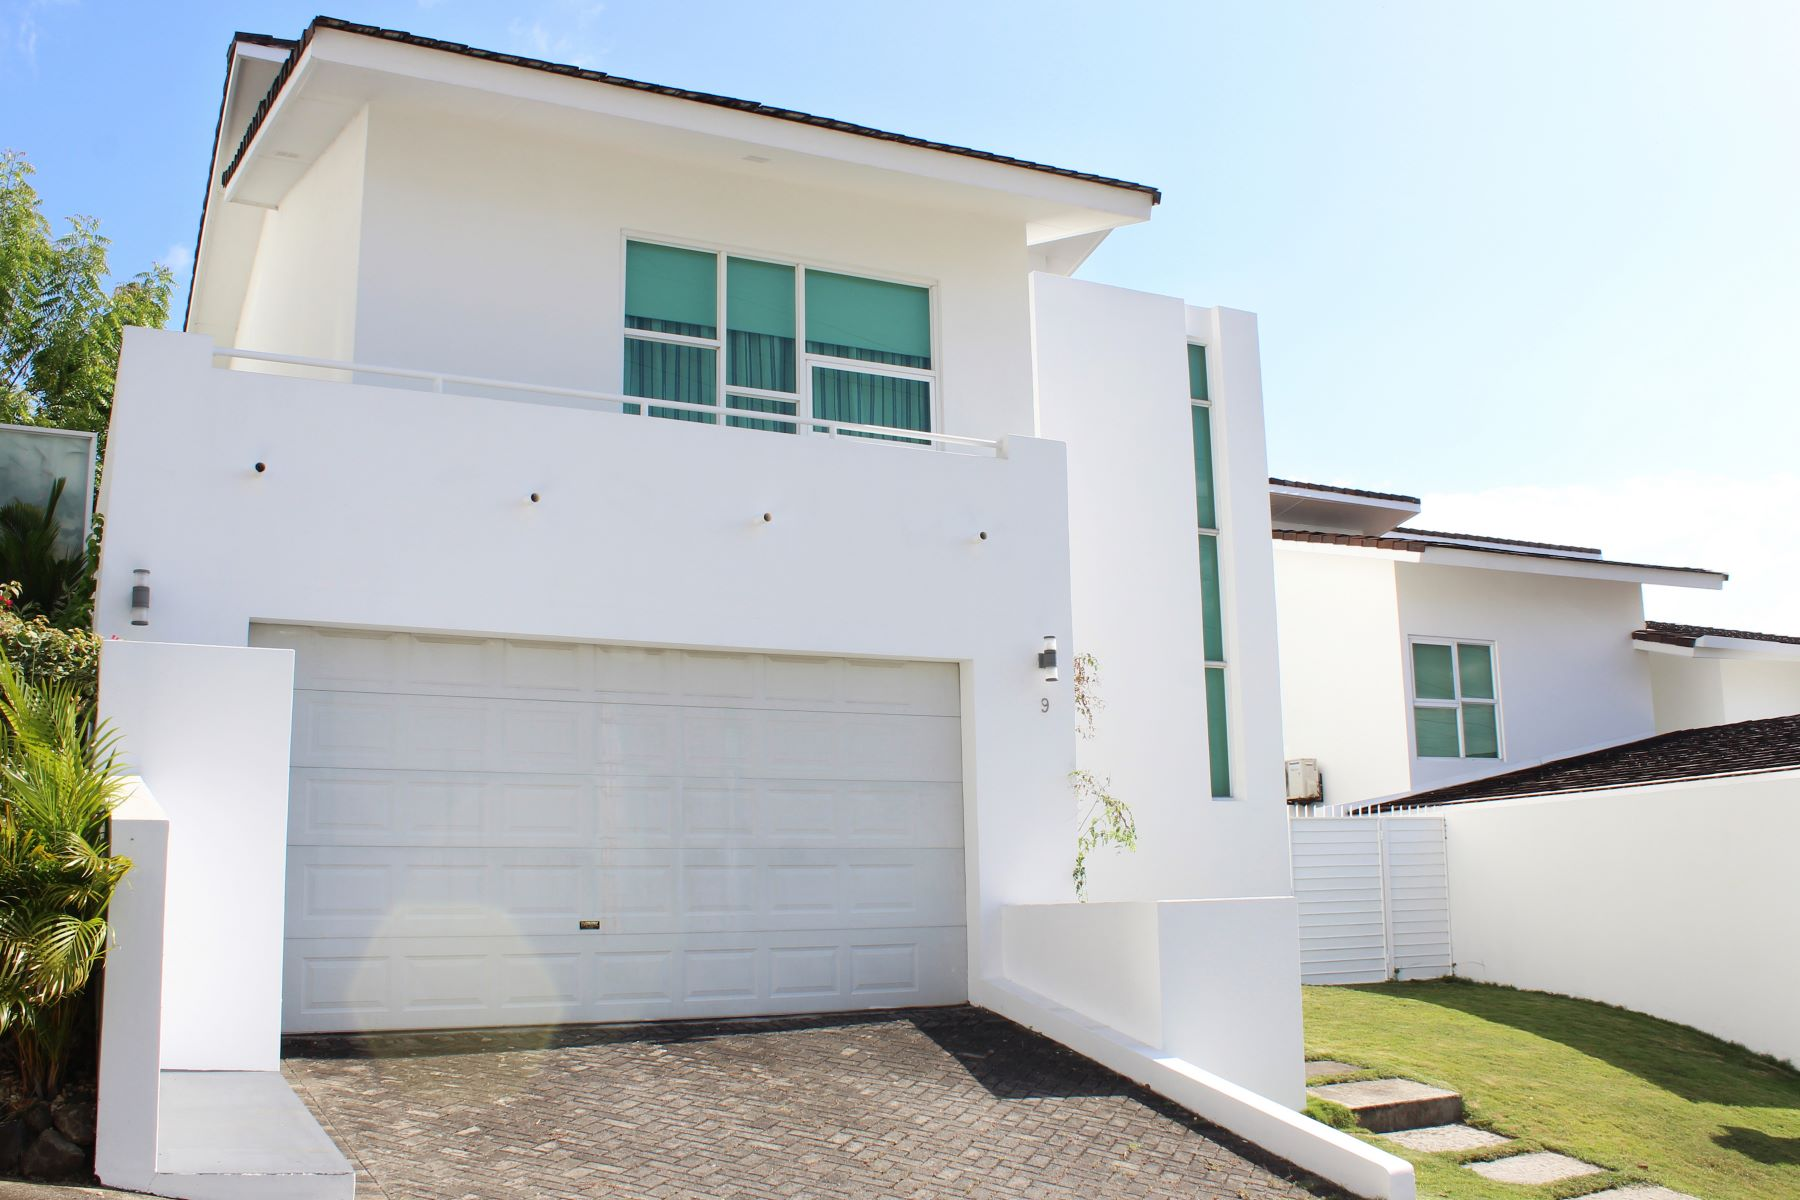 Single Family Home for Sale at Horizontes Other Panama, Panama, Panama